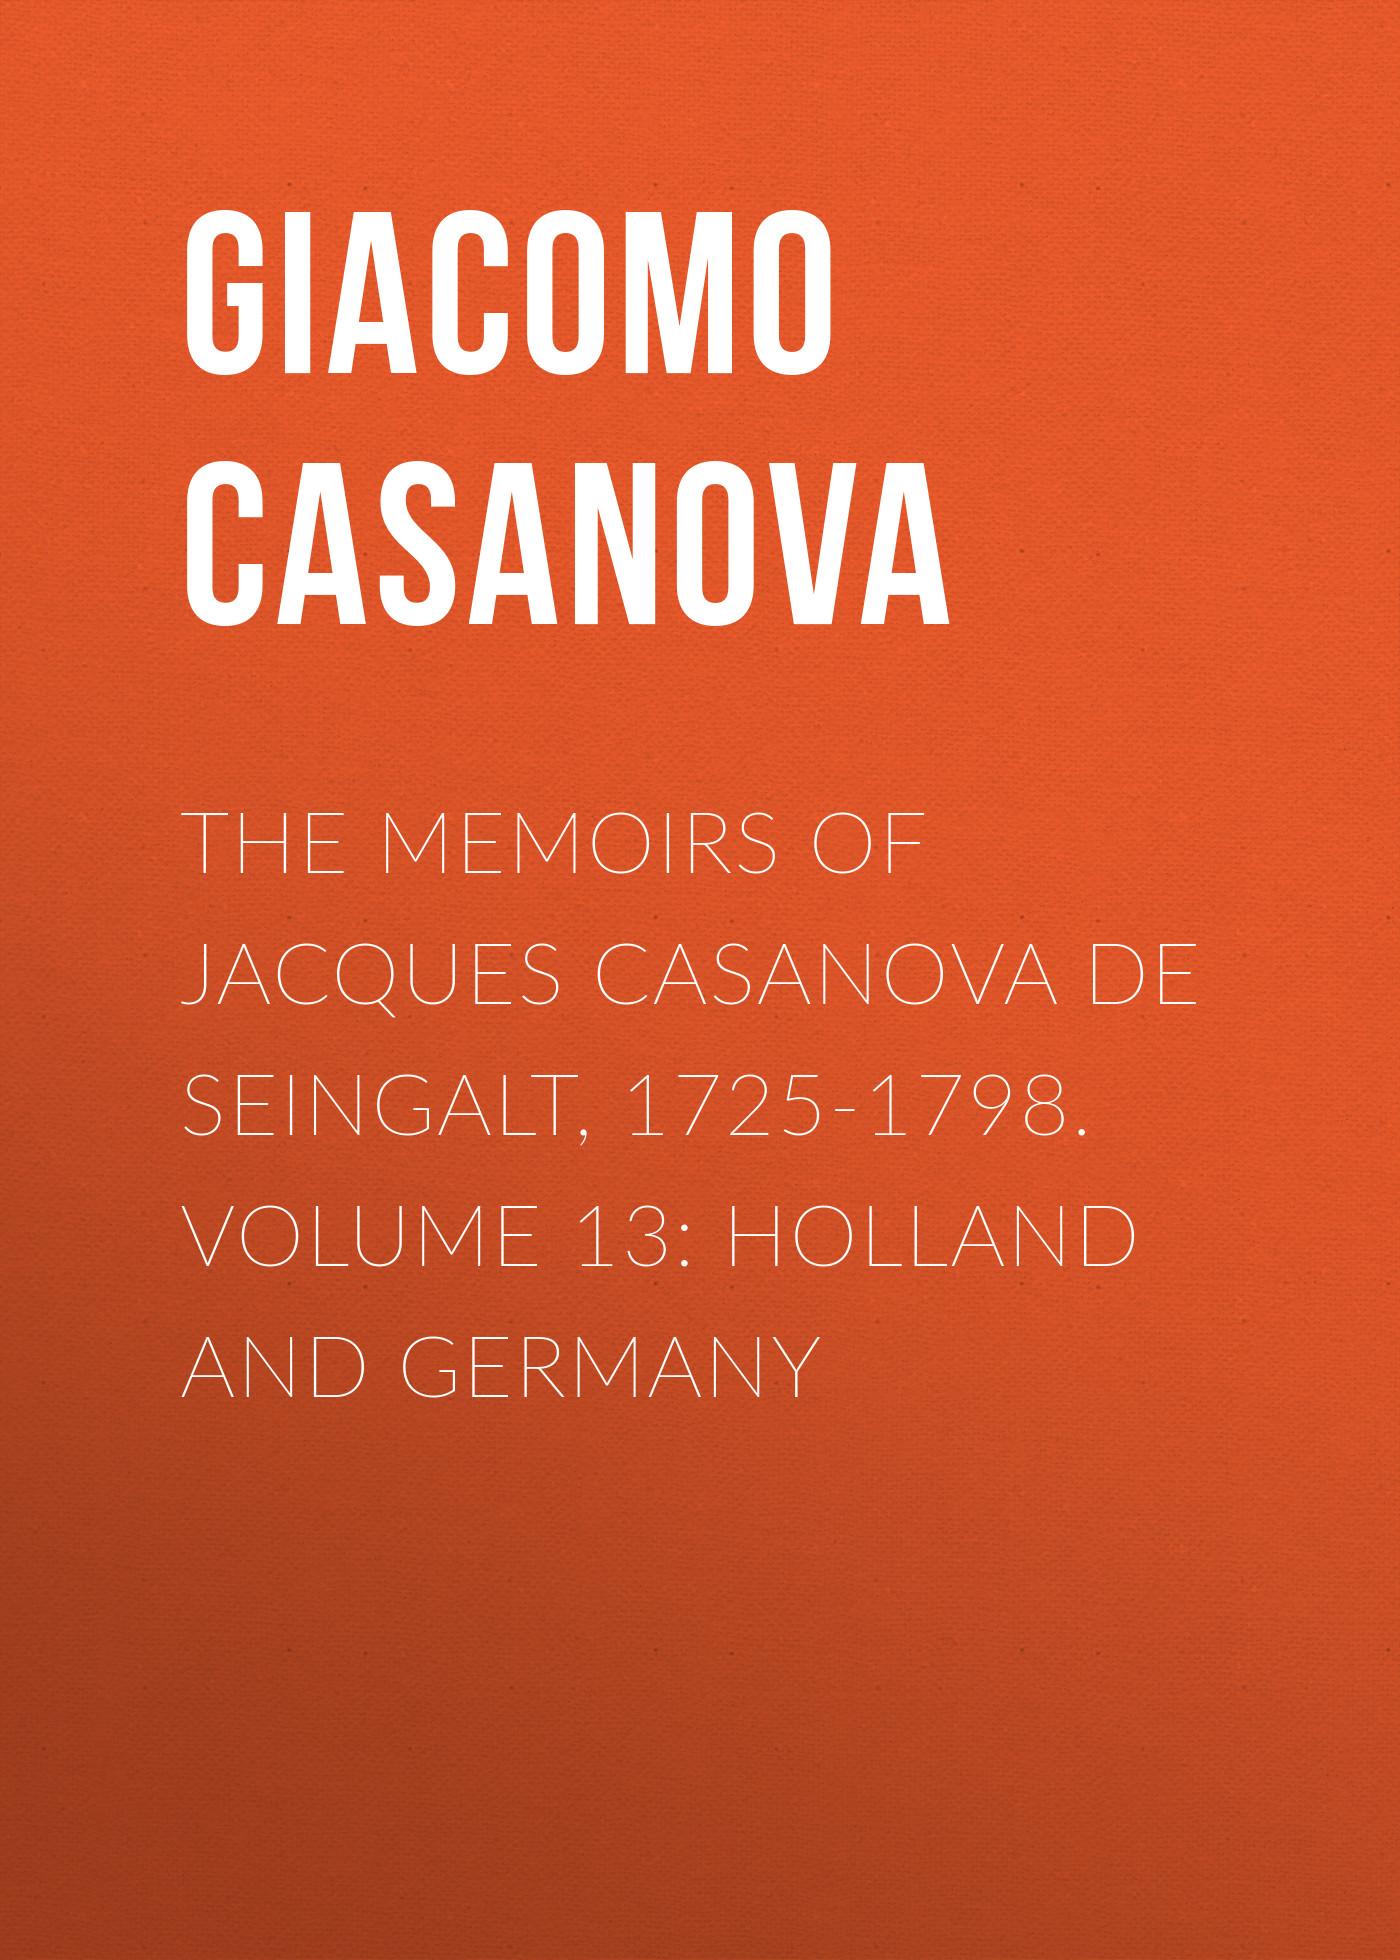 Giacomo Casanova The Memoirs of Jacques Casanova de Seingalt, 1725-1798. Volume 13: Holland and Germany giacomo casanova the memoirs of jacques casanova de seingalt 1725 1798 volume 22 to london